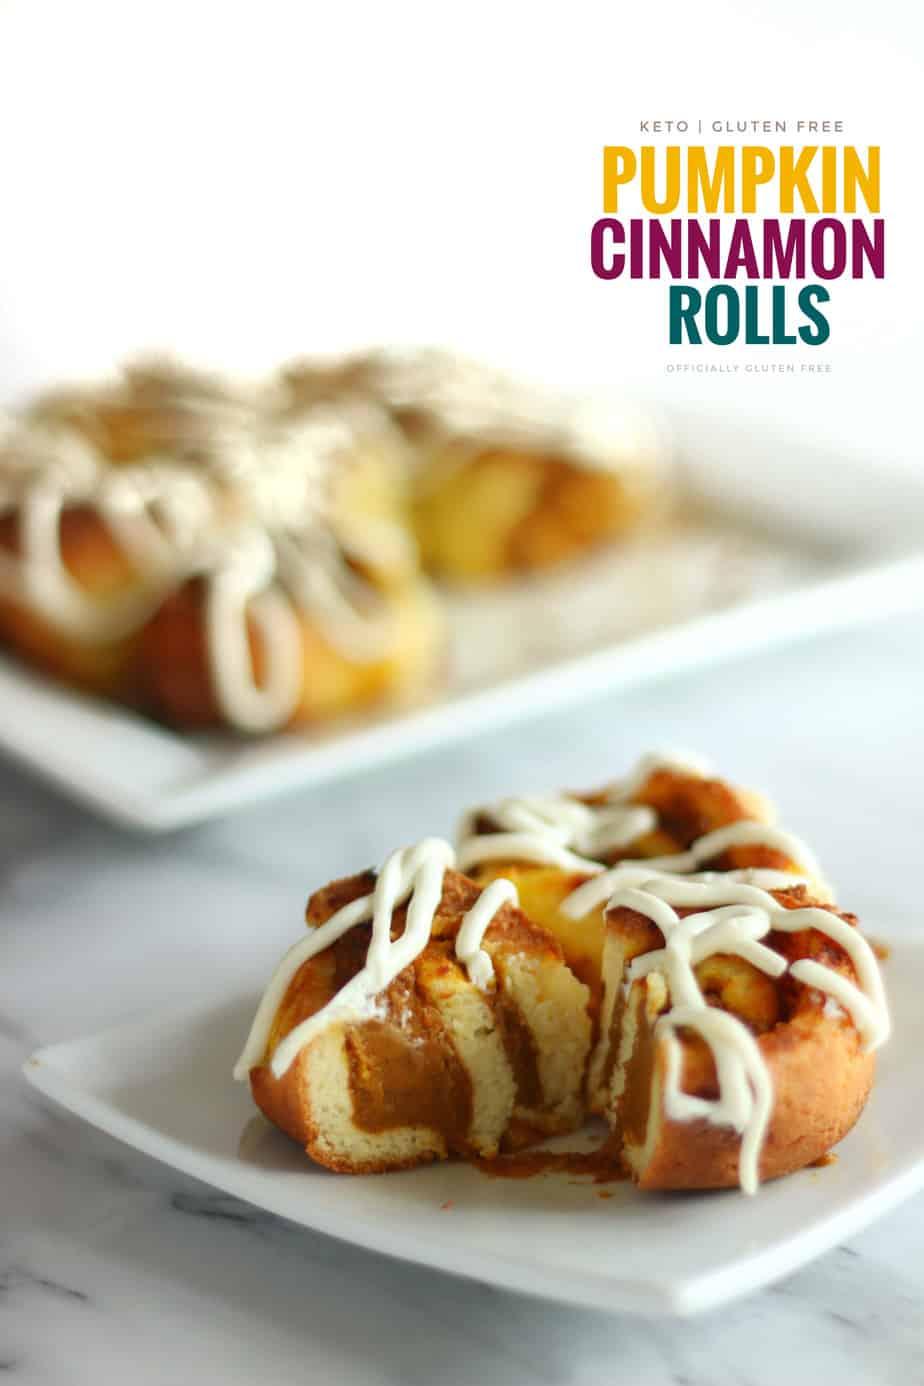 Keto Pumpkin Cinnamon Rolls